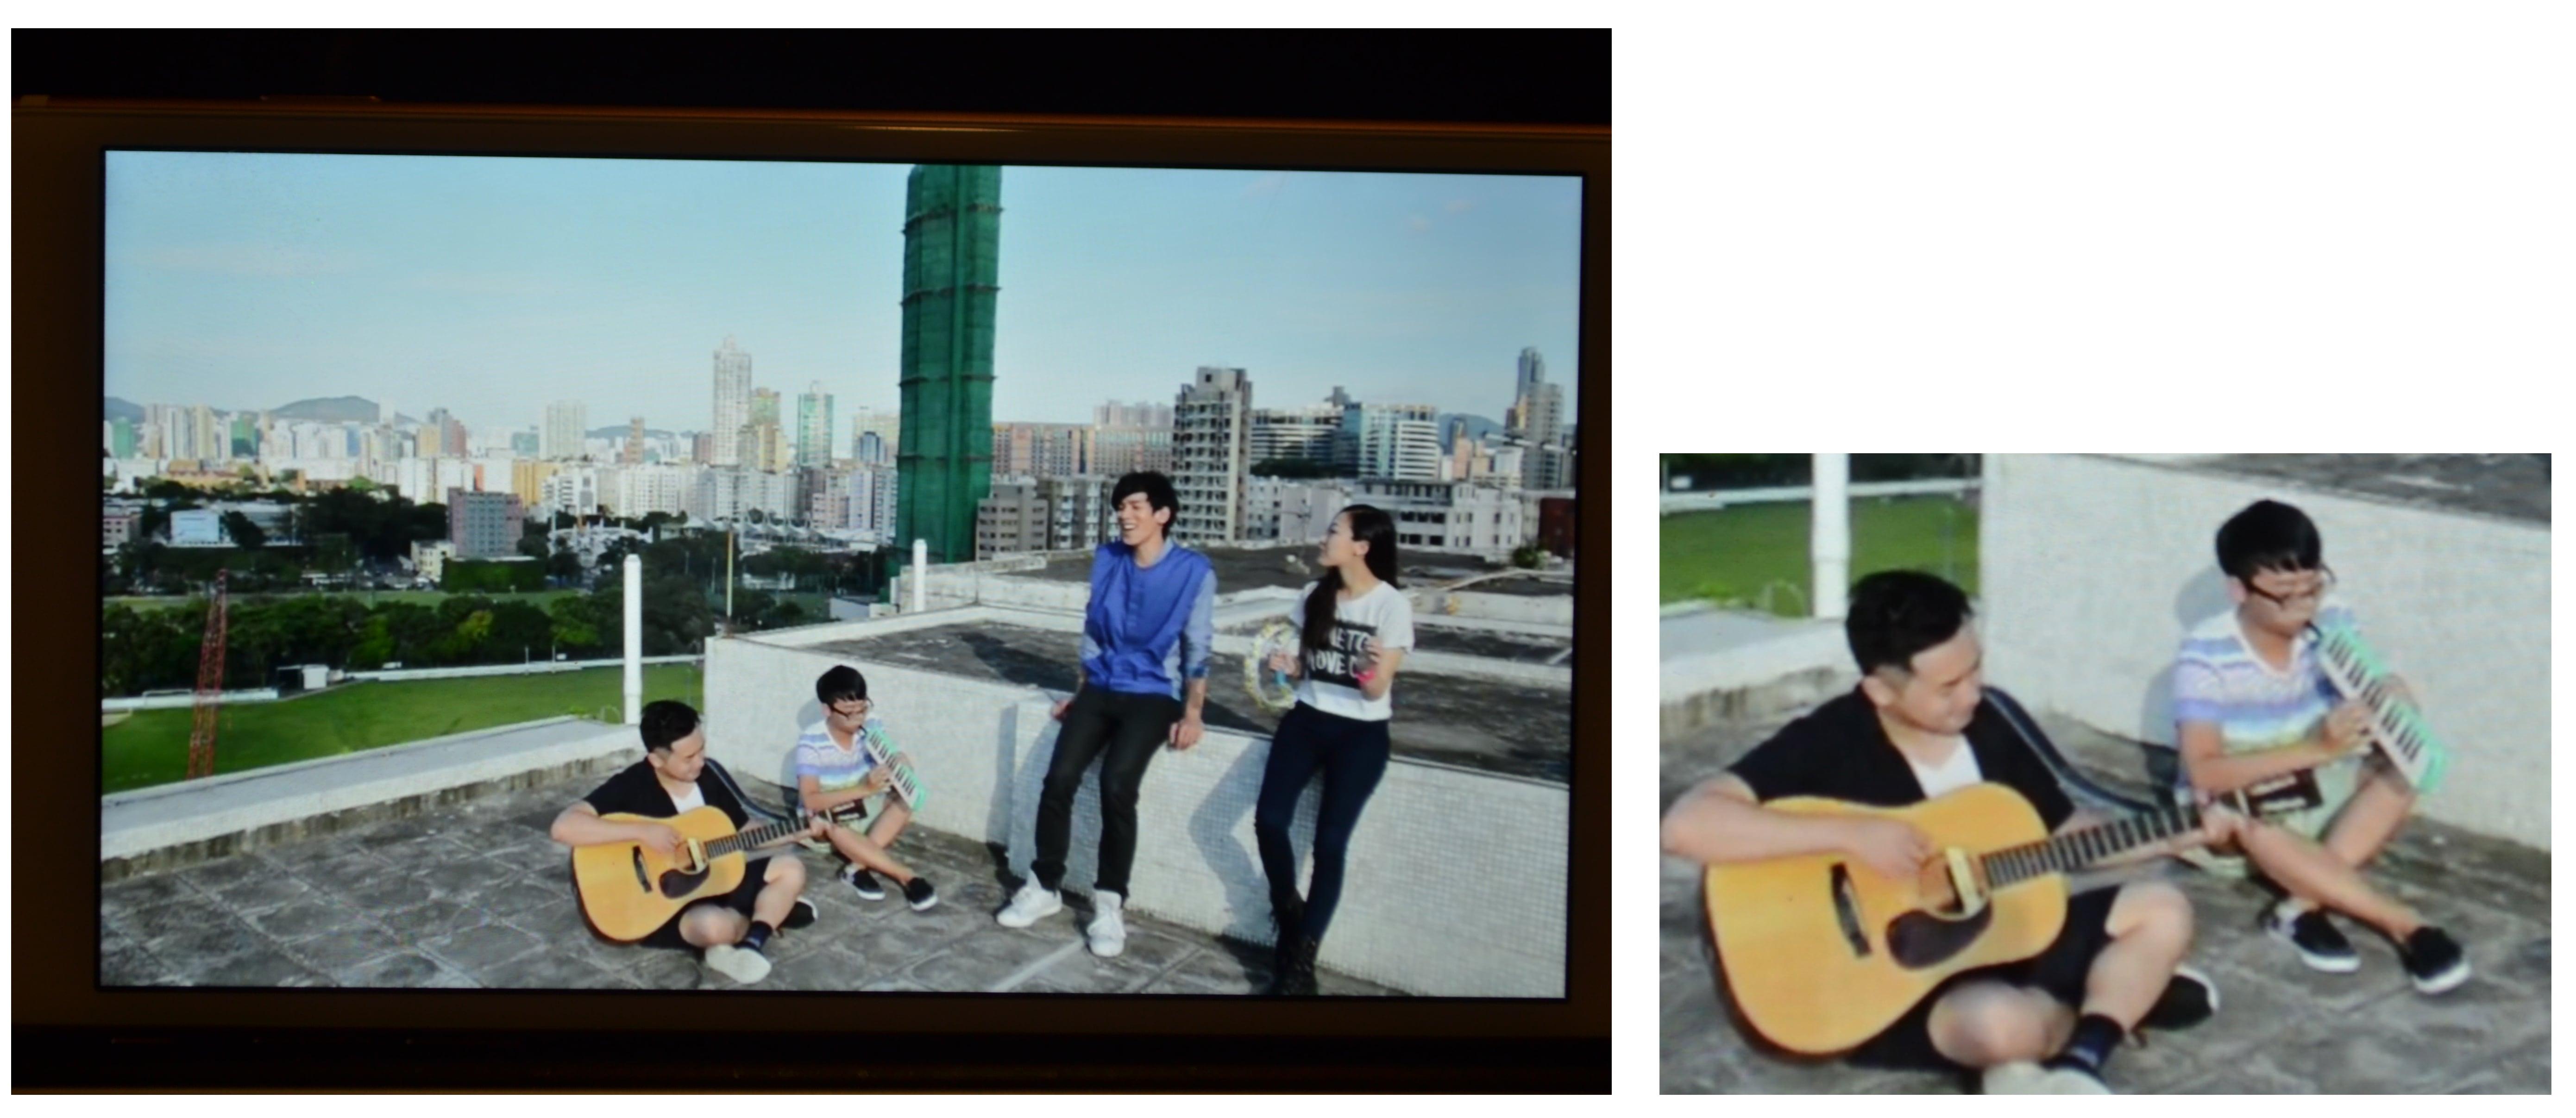 720p-Video_i6sPlus-min